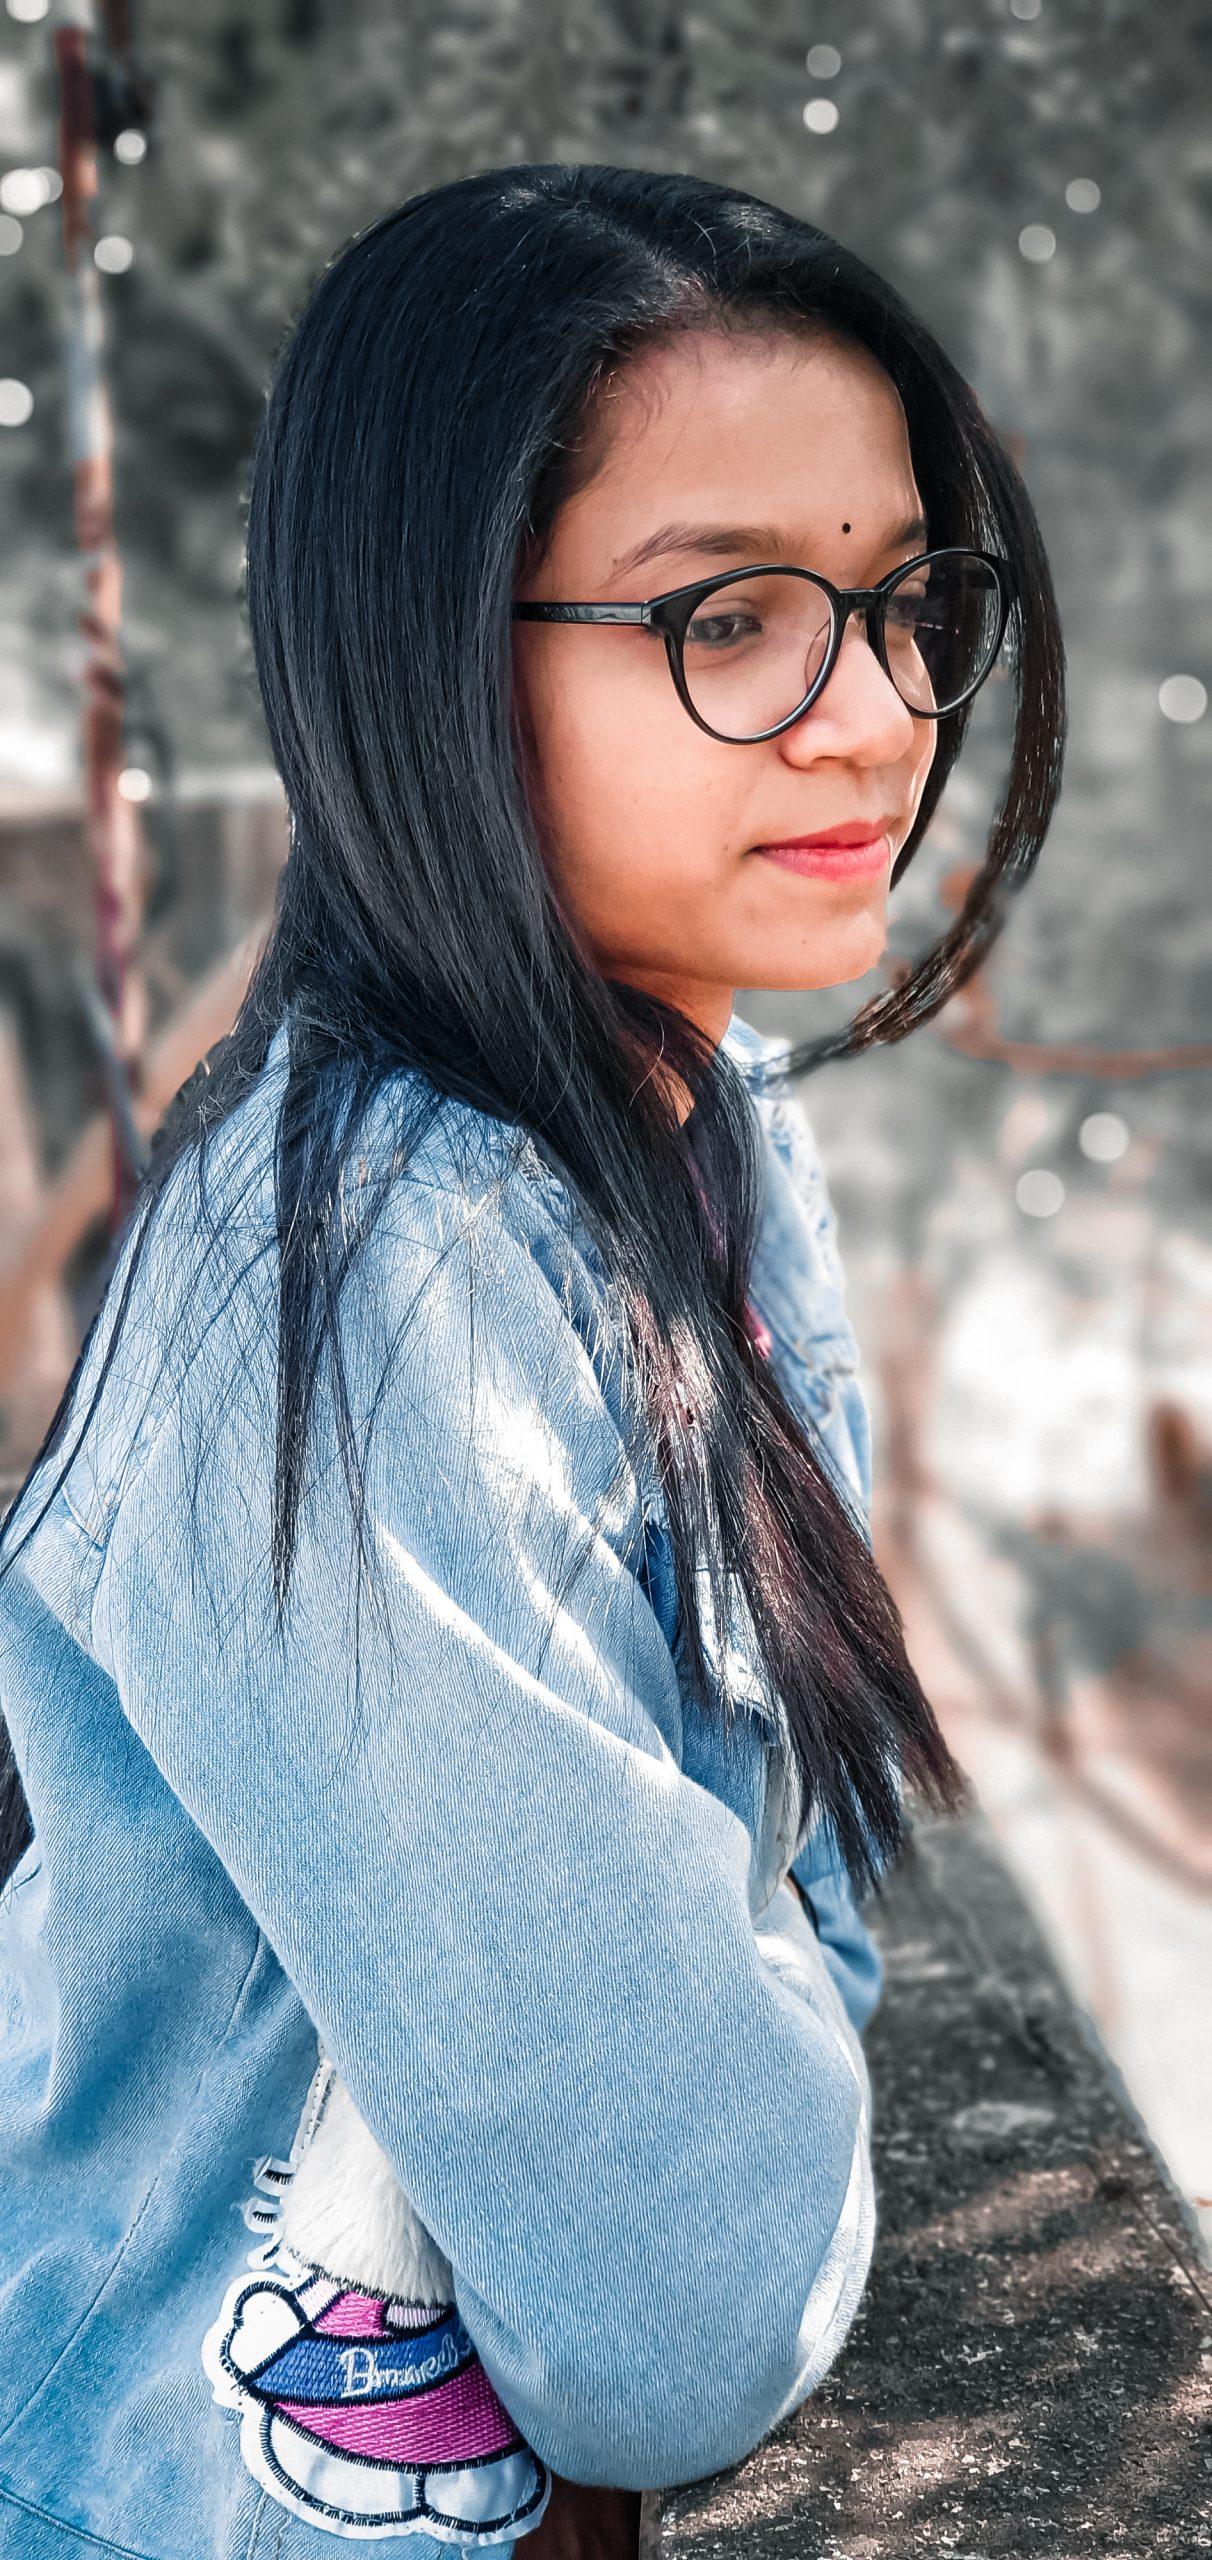 Girl posing near the wall in specs